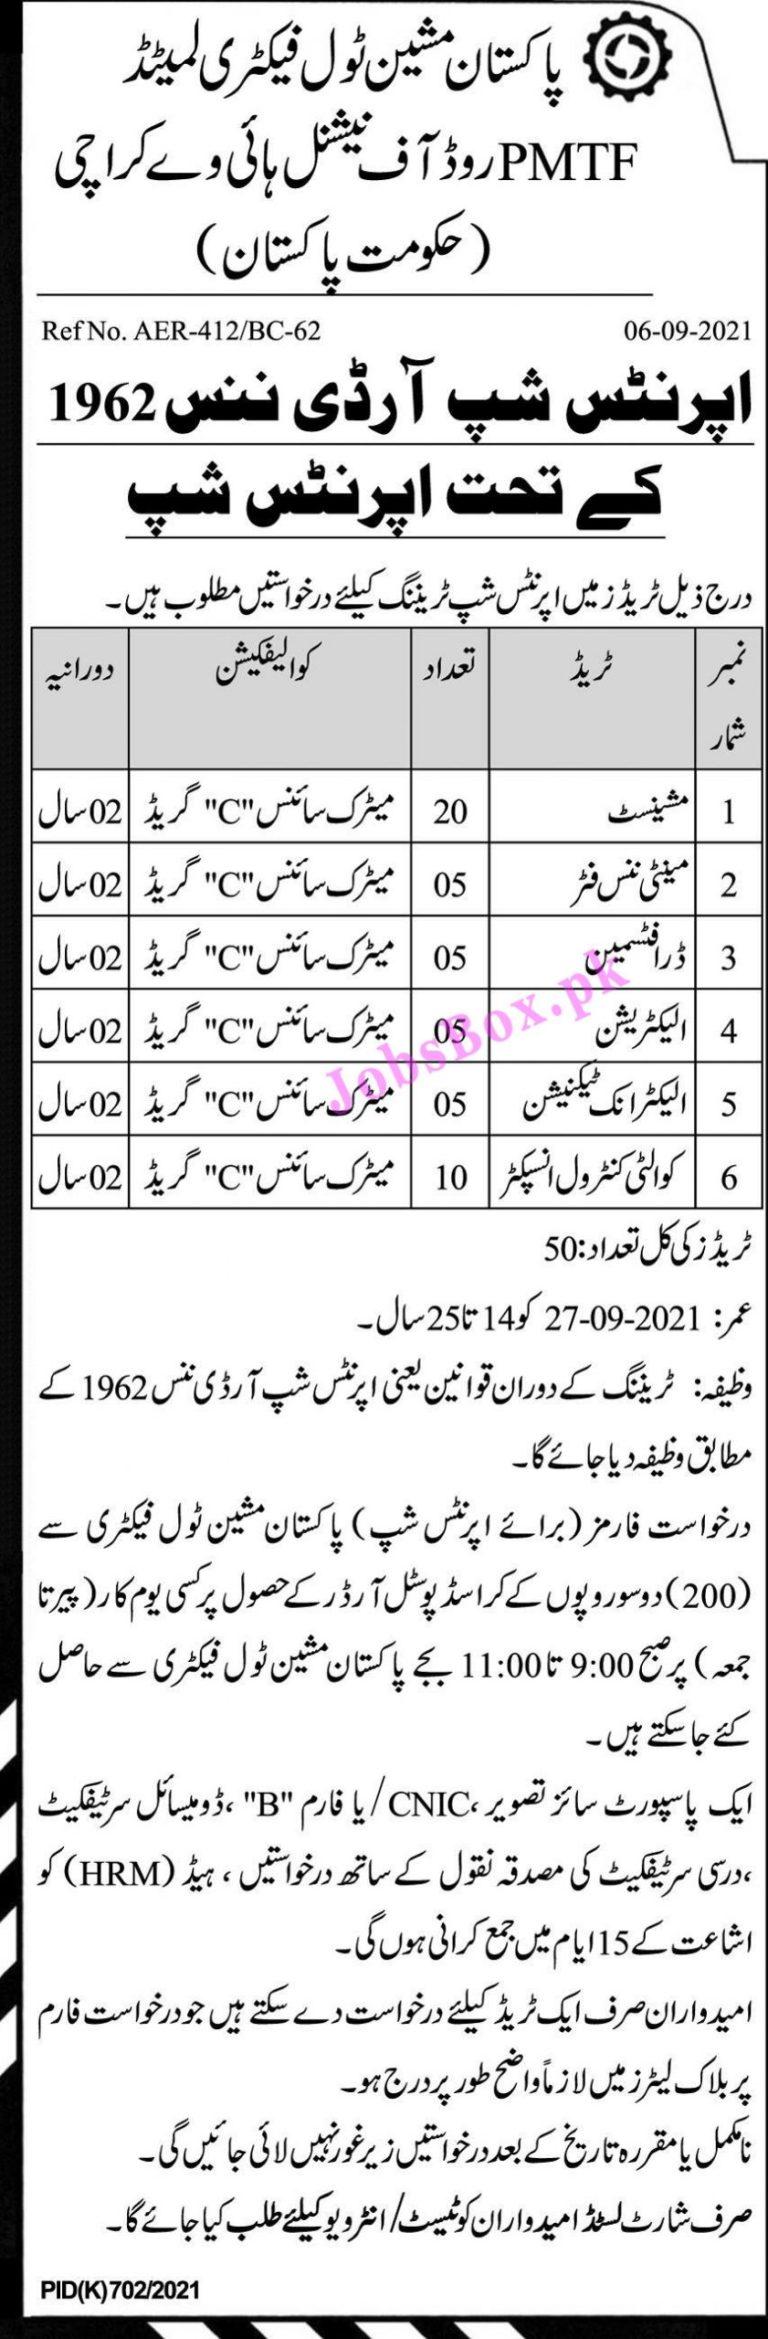 www.pmtfl.com - Pakistan Machine Tool Factory Apprenticeship Program in Pakistan